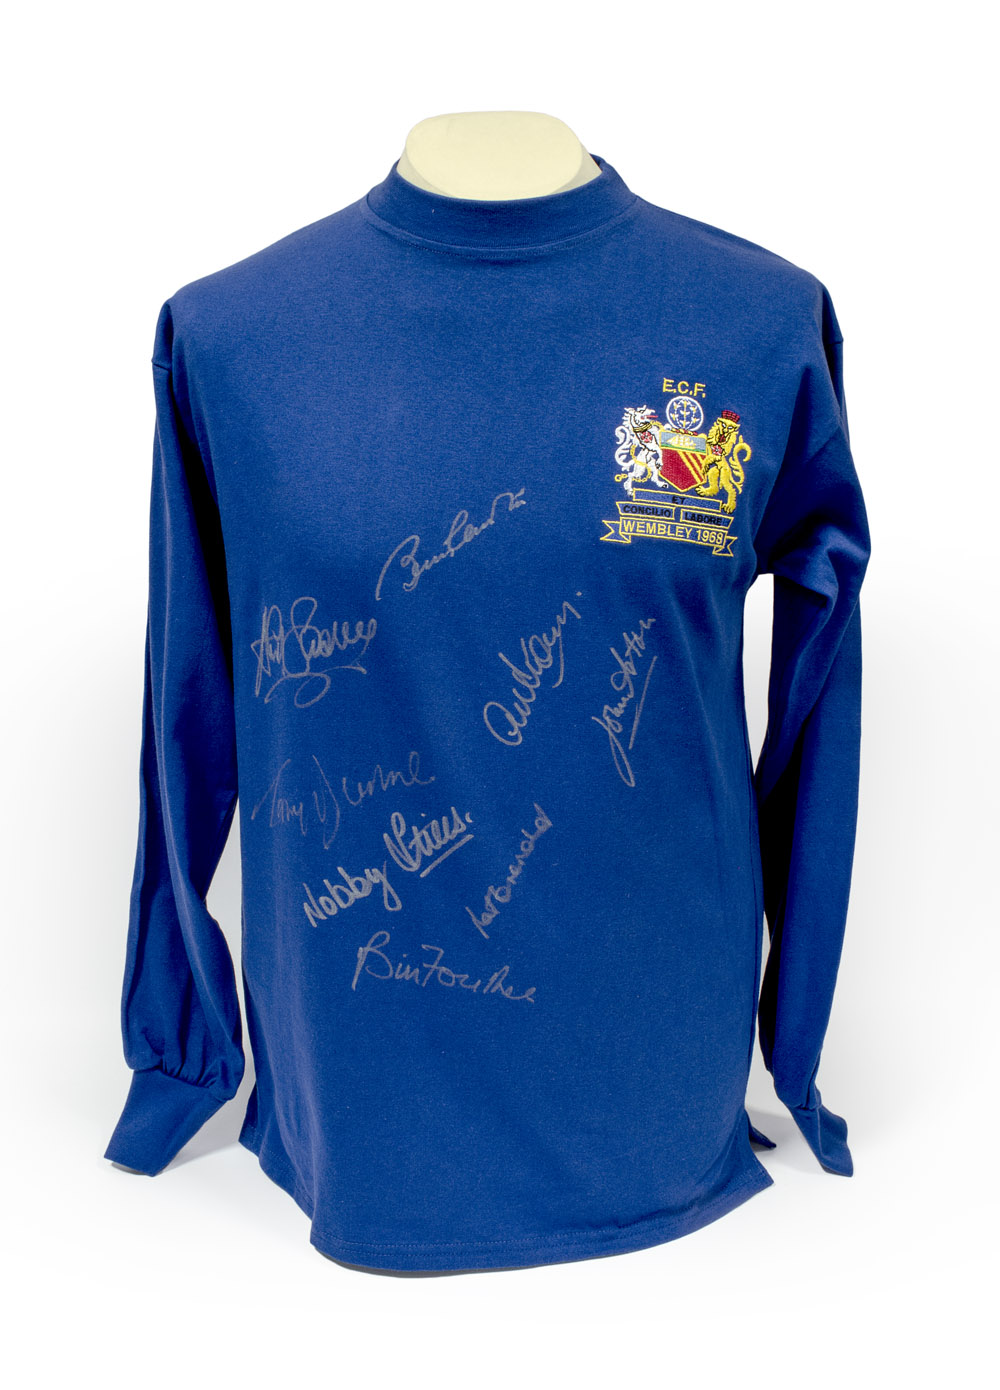 c87afbdf0 Manchester United Signed 1968 European Cup Final Shirt - NFM